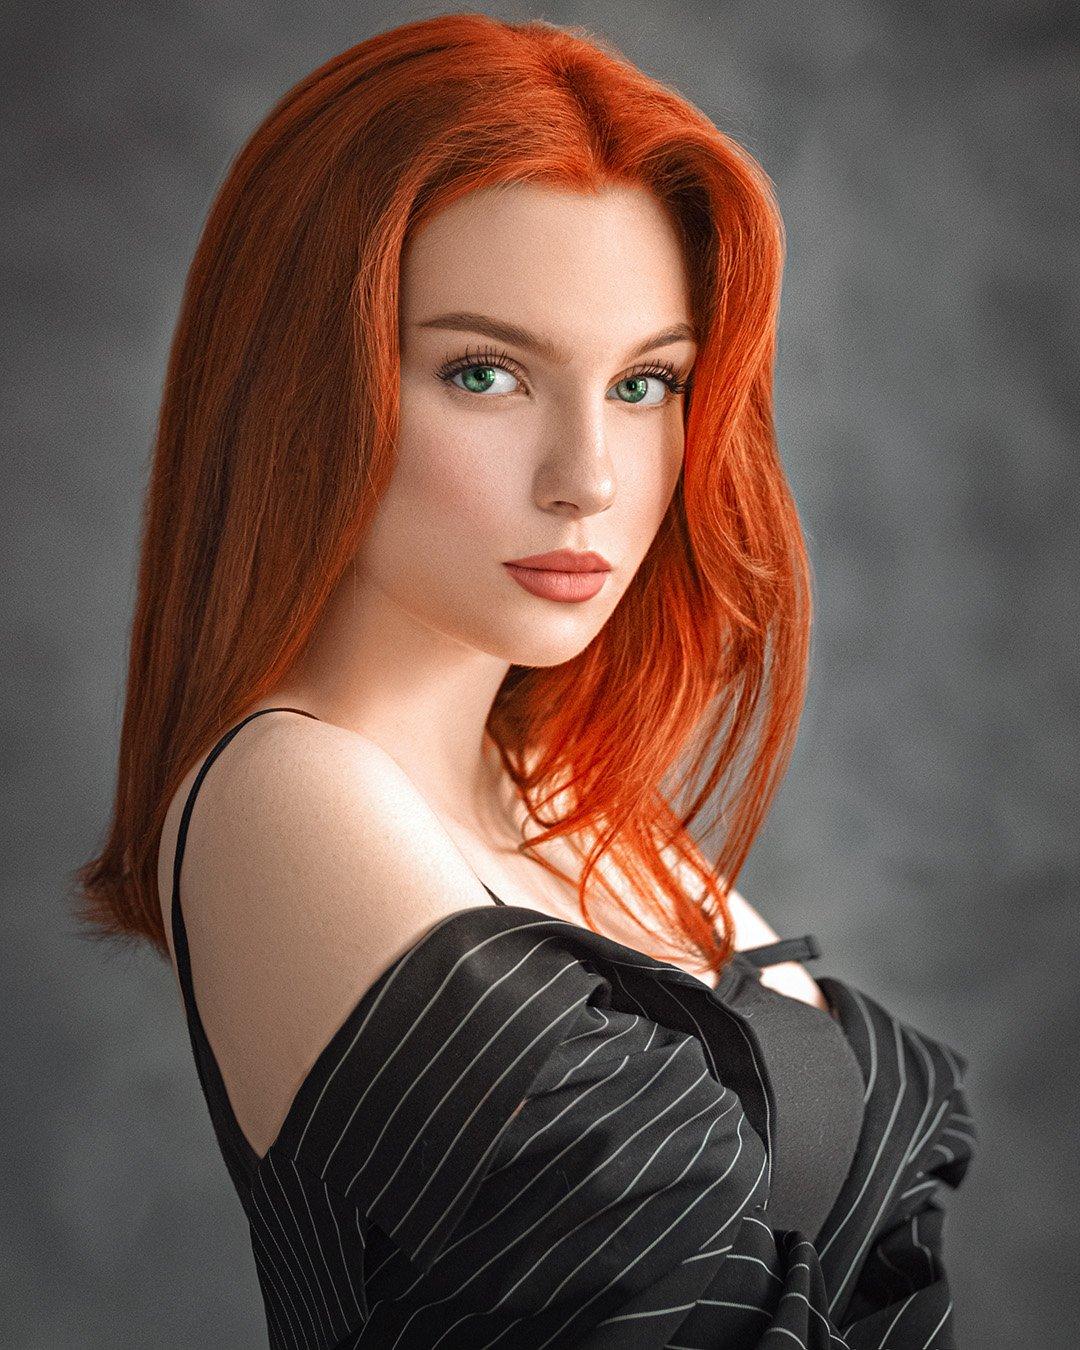 girl, portrait, art, девушка, портрет, арт, Евгений Сибиряев